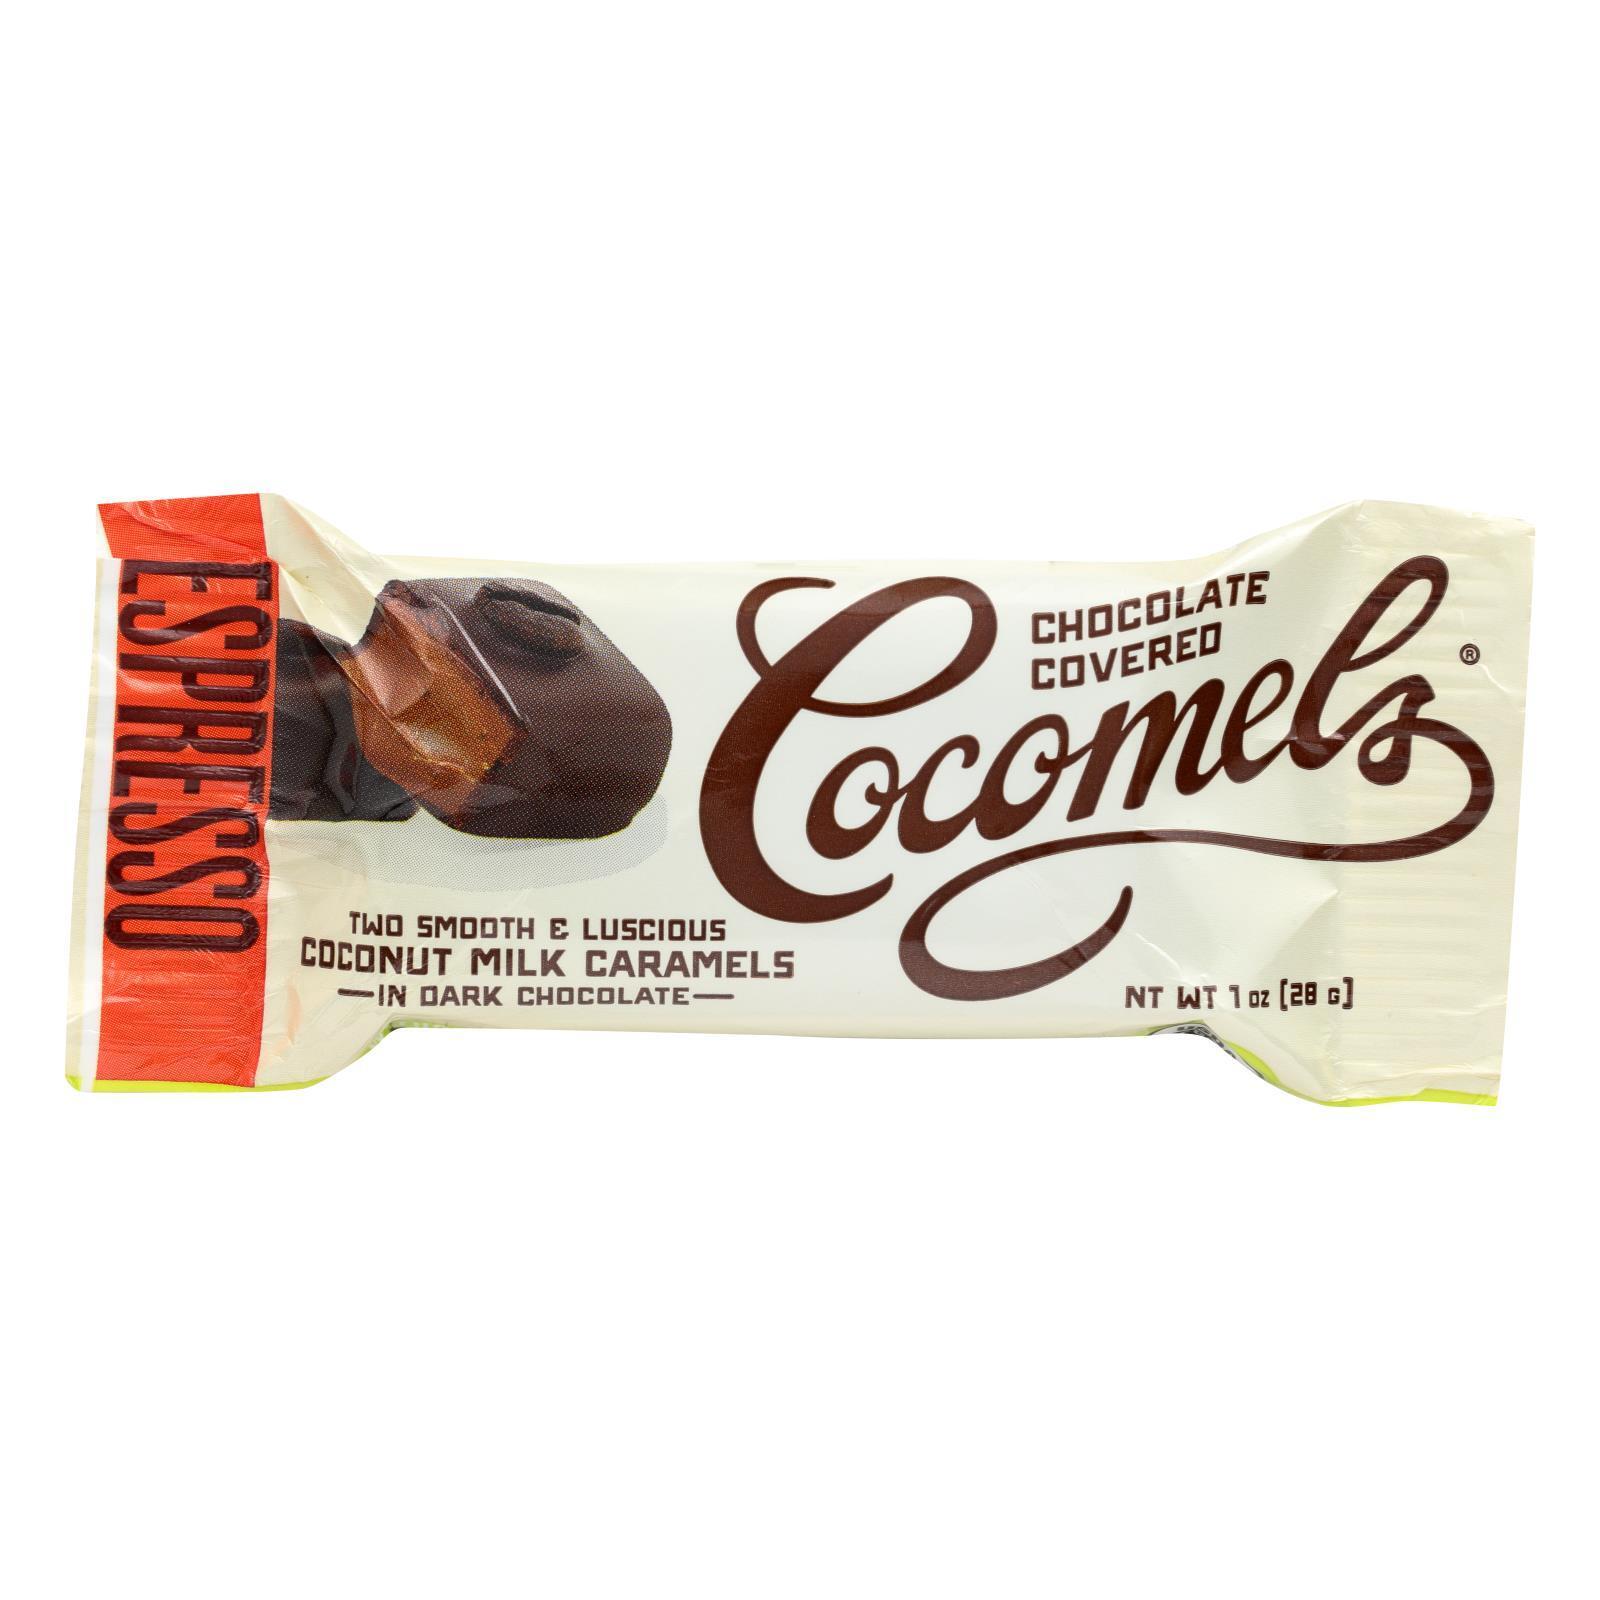 Cocomel Dark Chocolate Covered Cocomels - Espresso - Case of 15 - 1 oz.